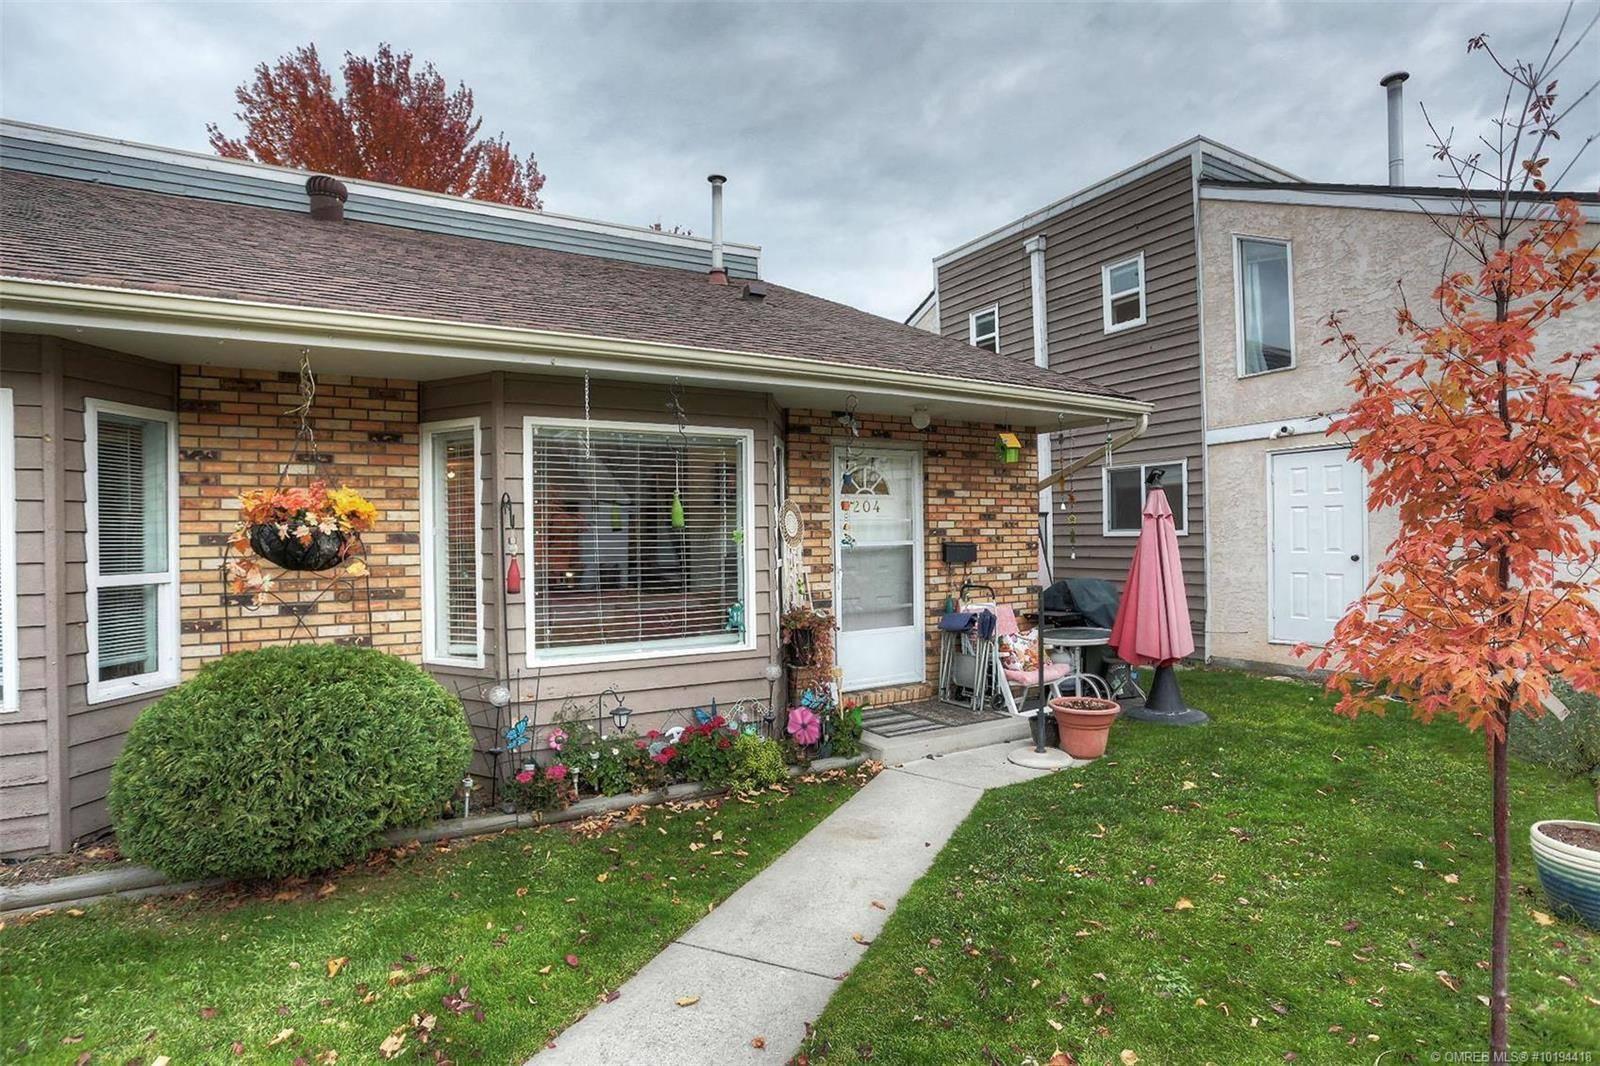 Townhouse for sale at 3155 Gordon Rd Unit 204 Kelowna British Columbia - MLS: 10194418